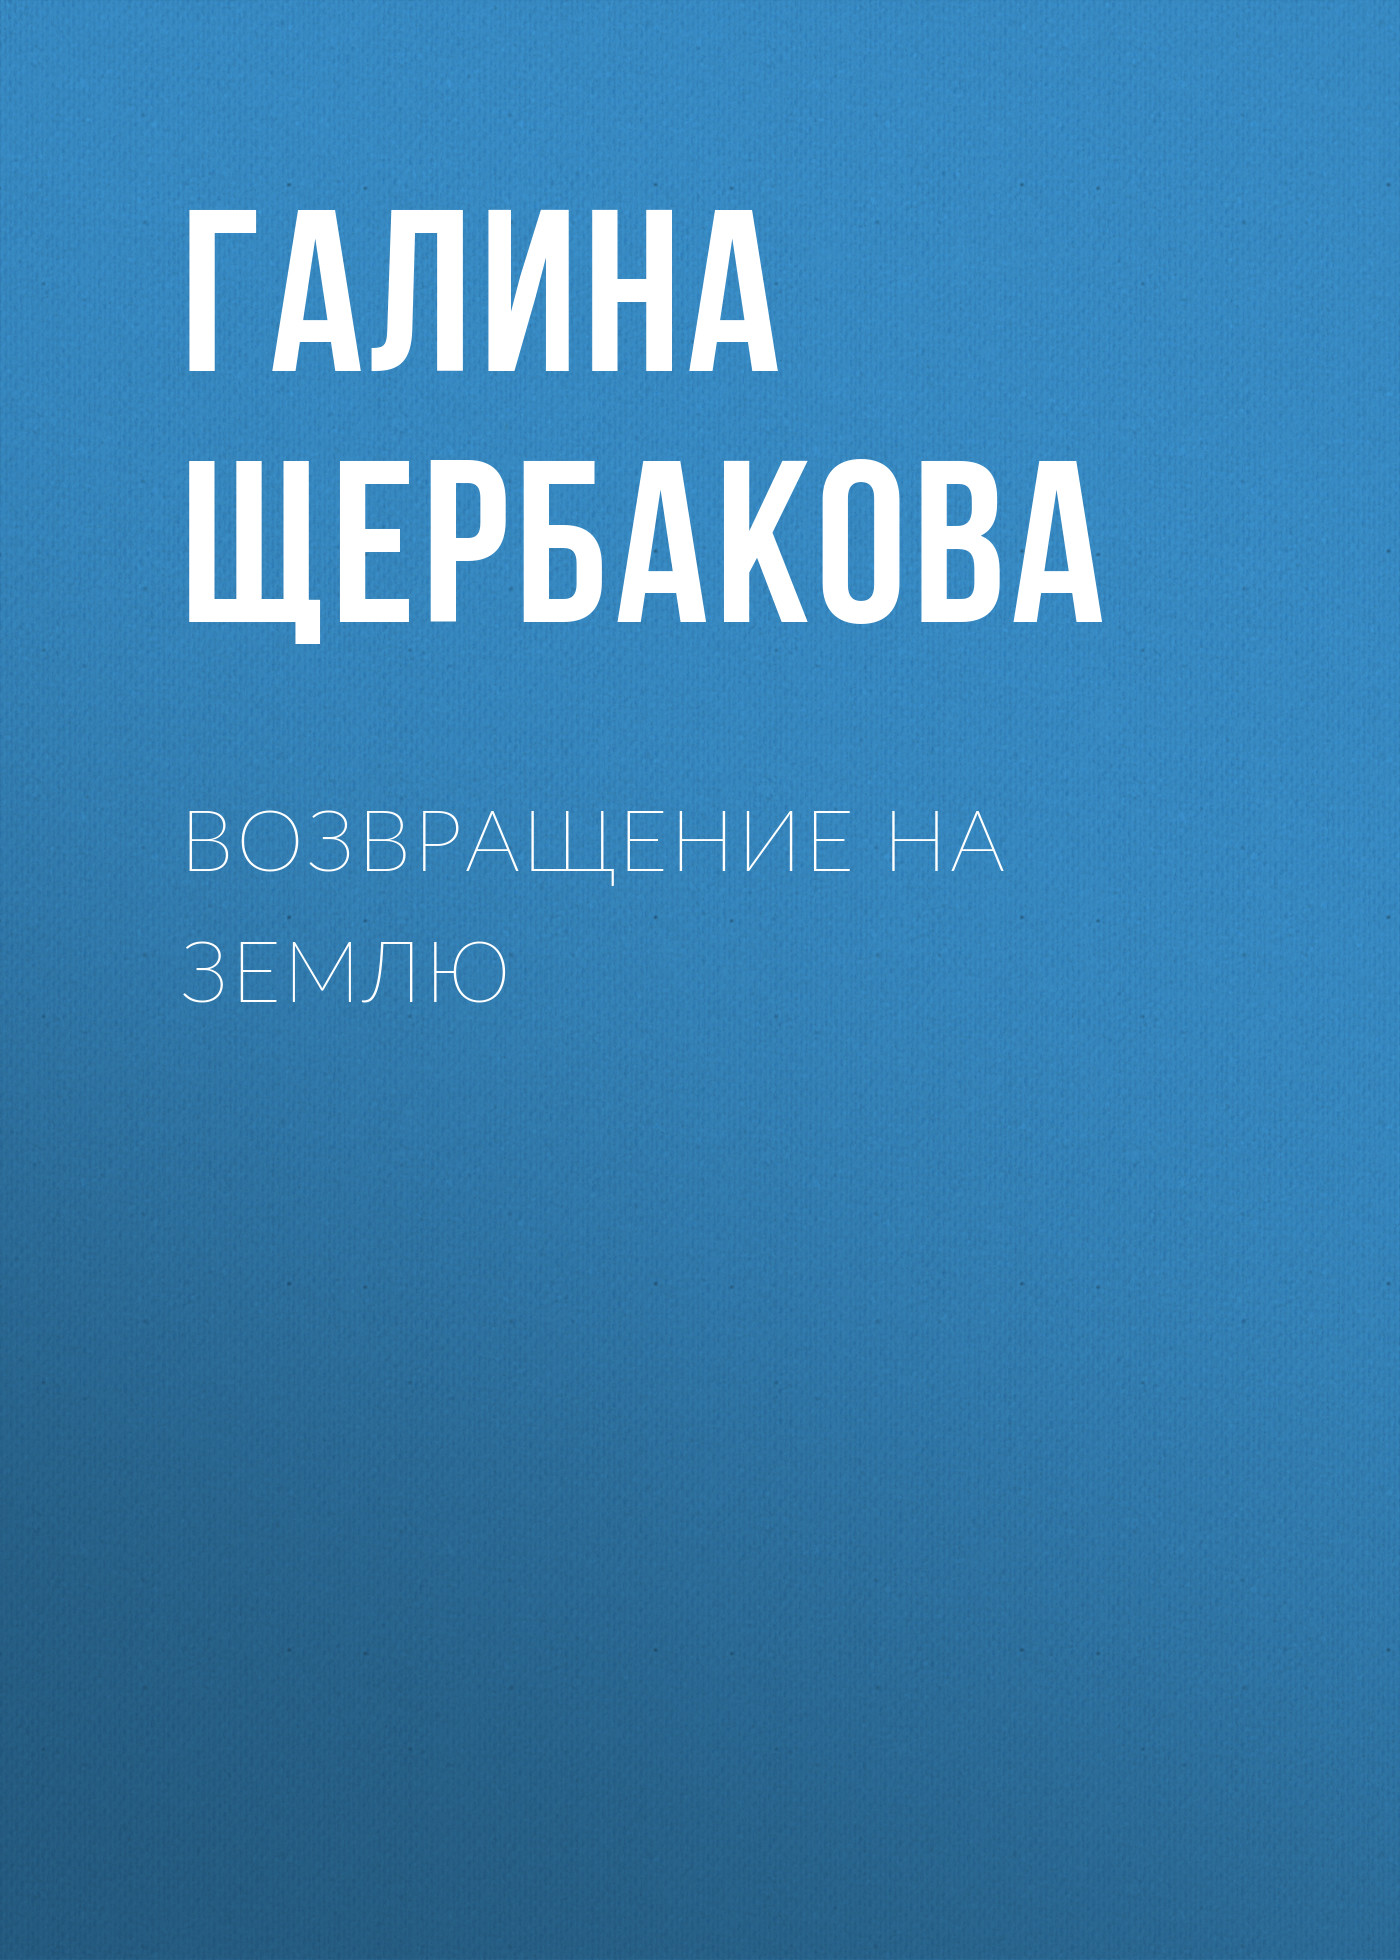 Галина Щербакова Возвращение на землю землю дёшево